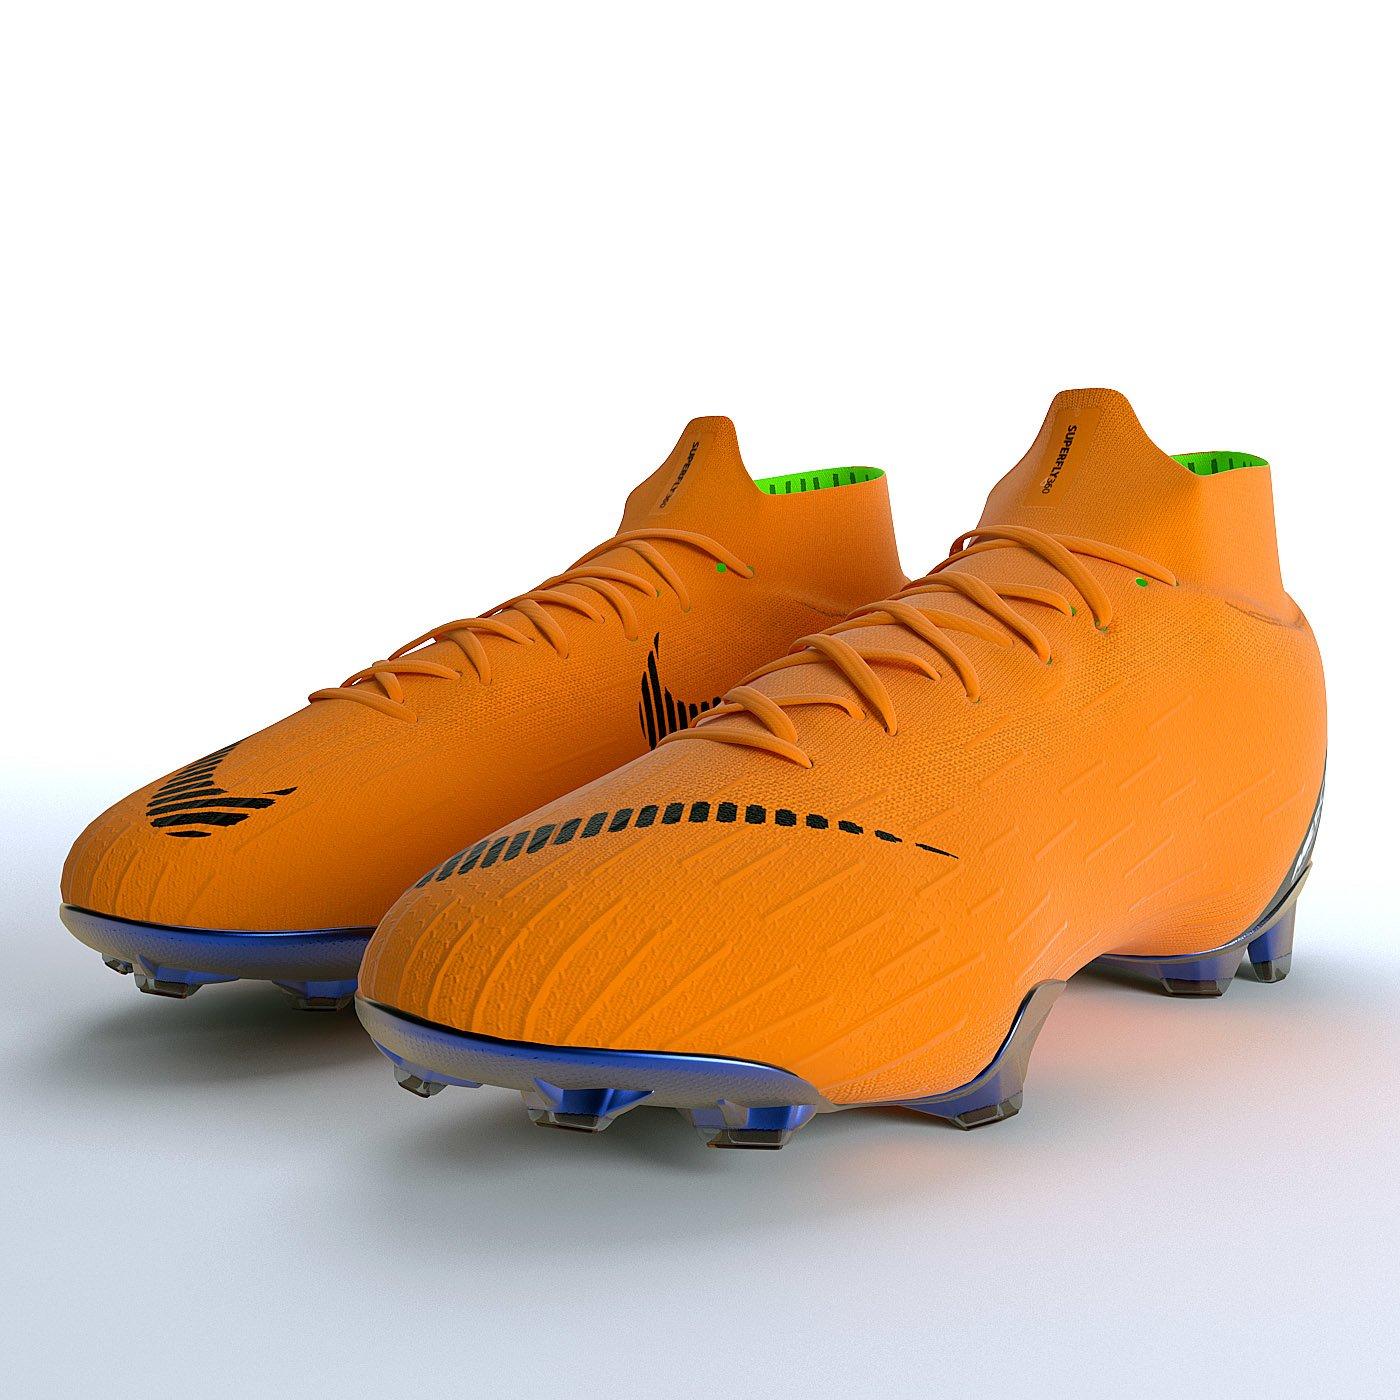 separation shoes 15596 92bf7 Nike Mercurial Superfly 360 Elite 3D Model in Clothing 3DExport